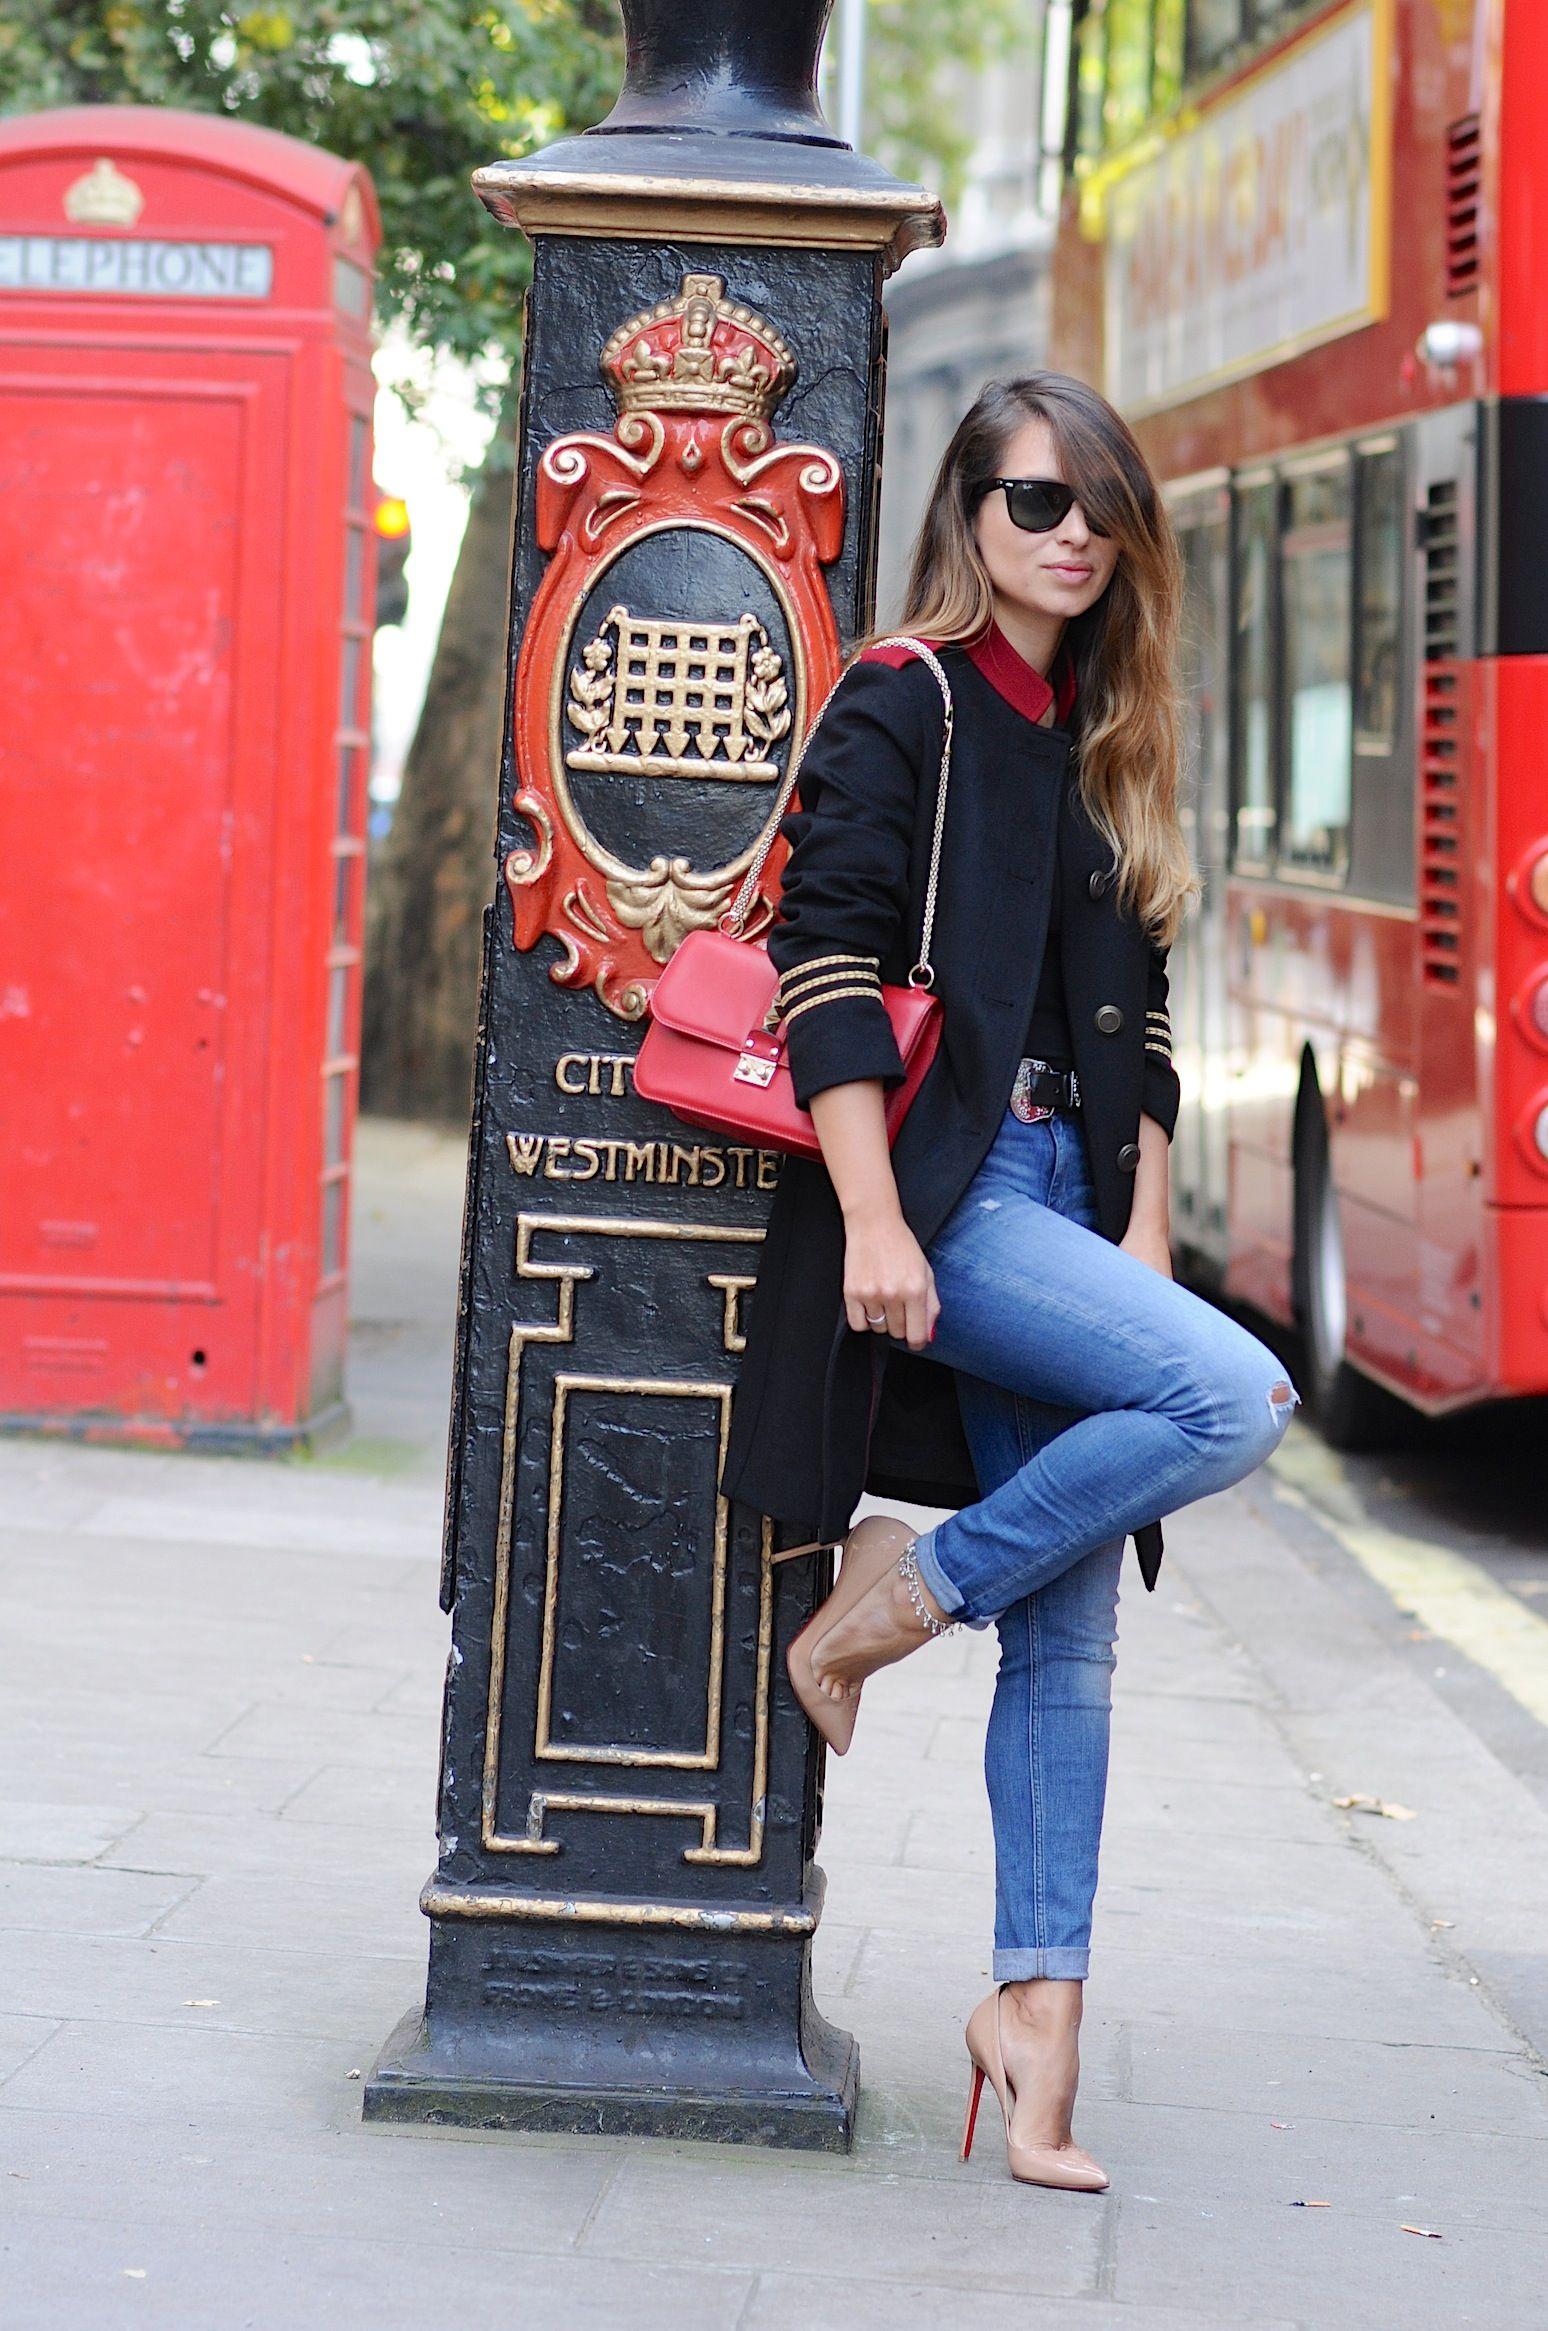 photo london street style christian louboutin redsoles valentino rockstud.jpg